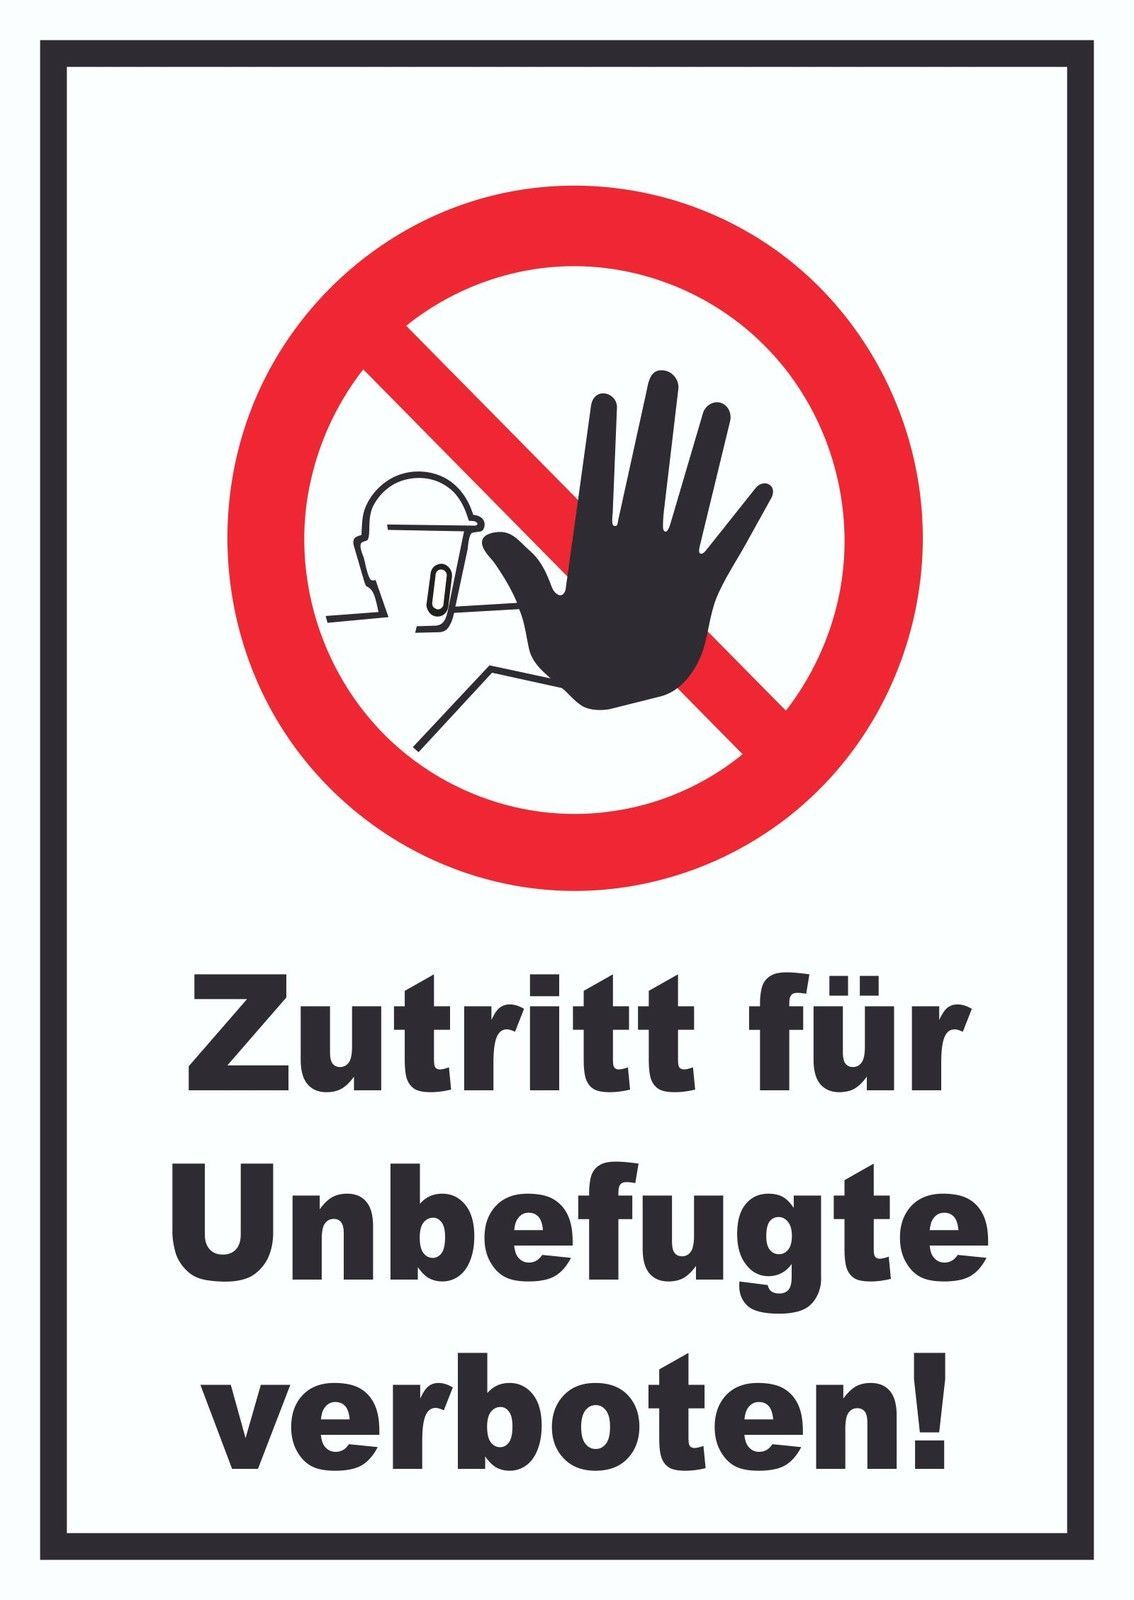 verbotsschild zutritt f r unbefugte verboten verbot schilder zutritt zugang eintritt. Black Bedroom Furniture Sets. Home Design Ideas